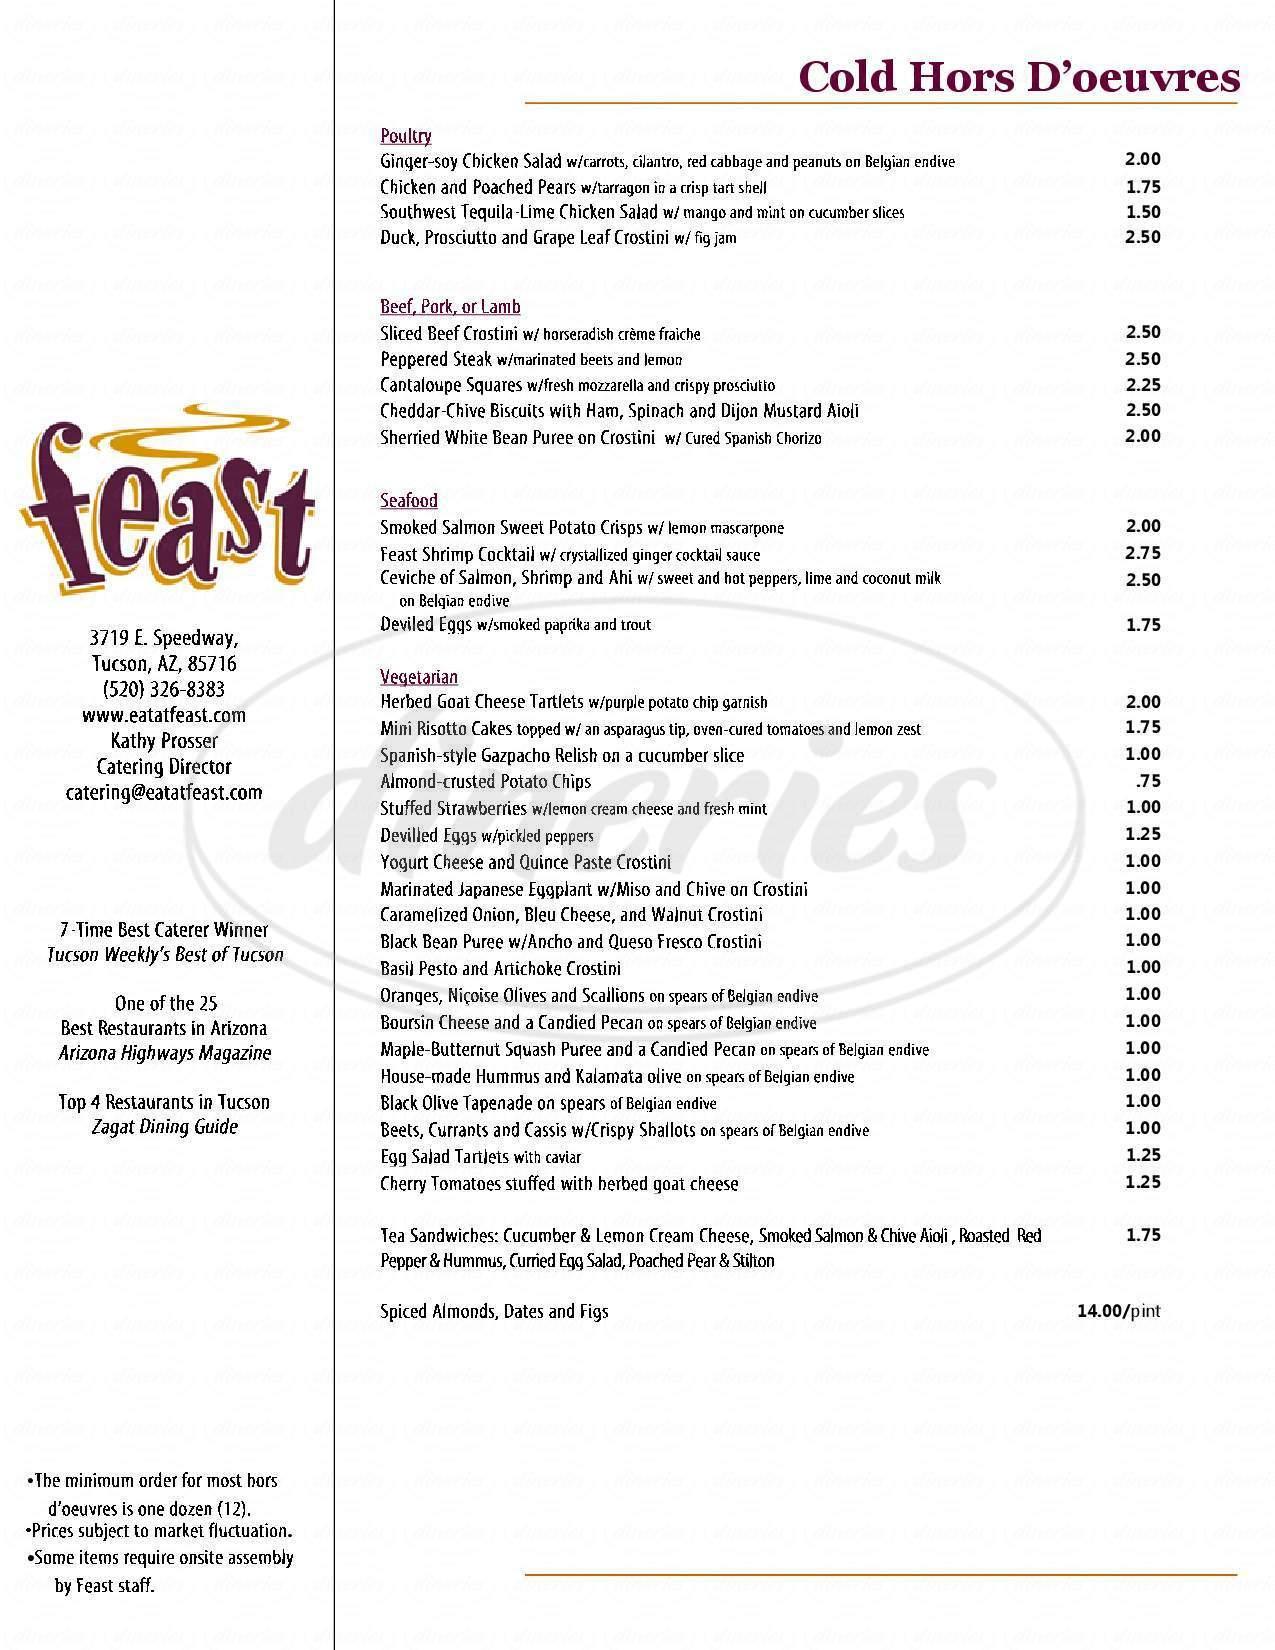 menu for Feast